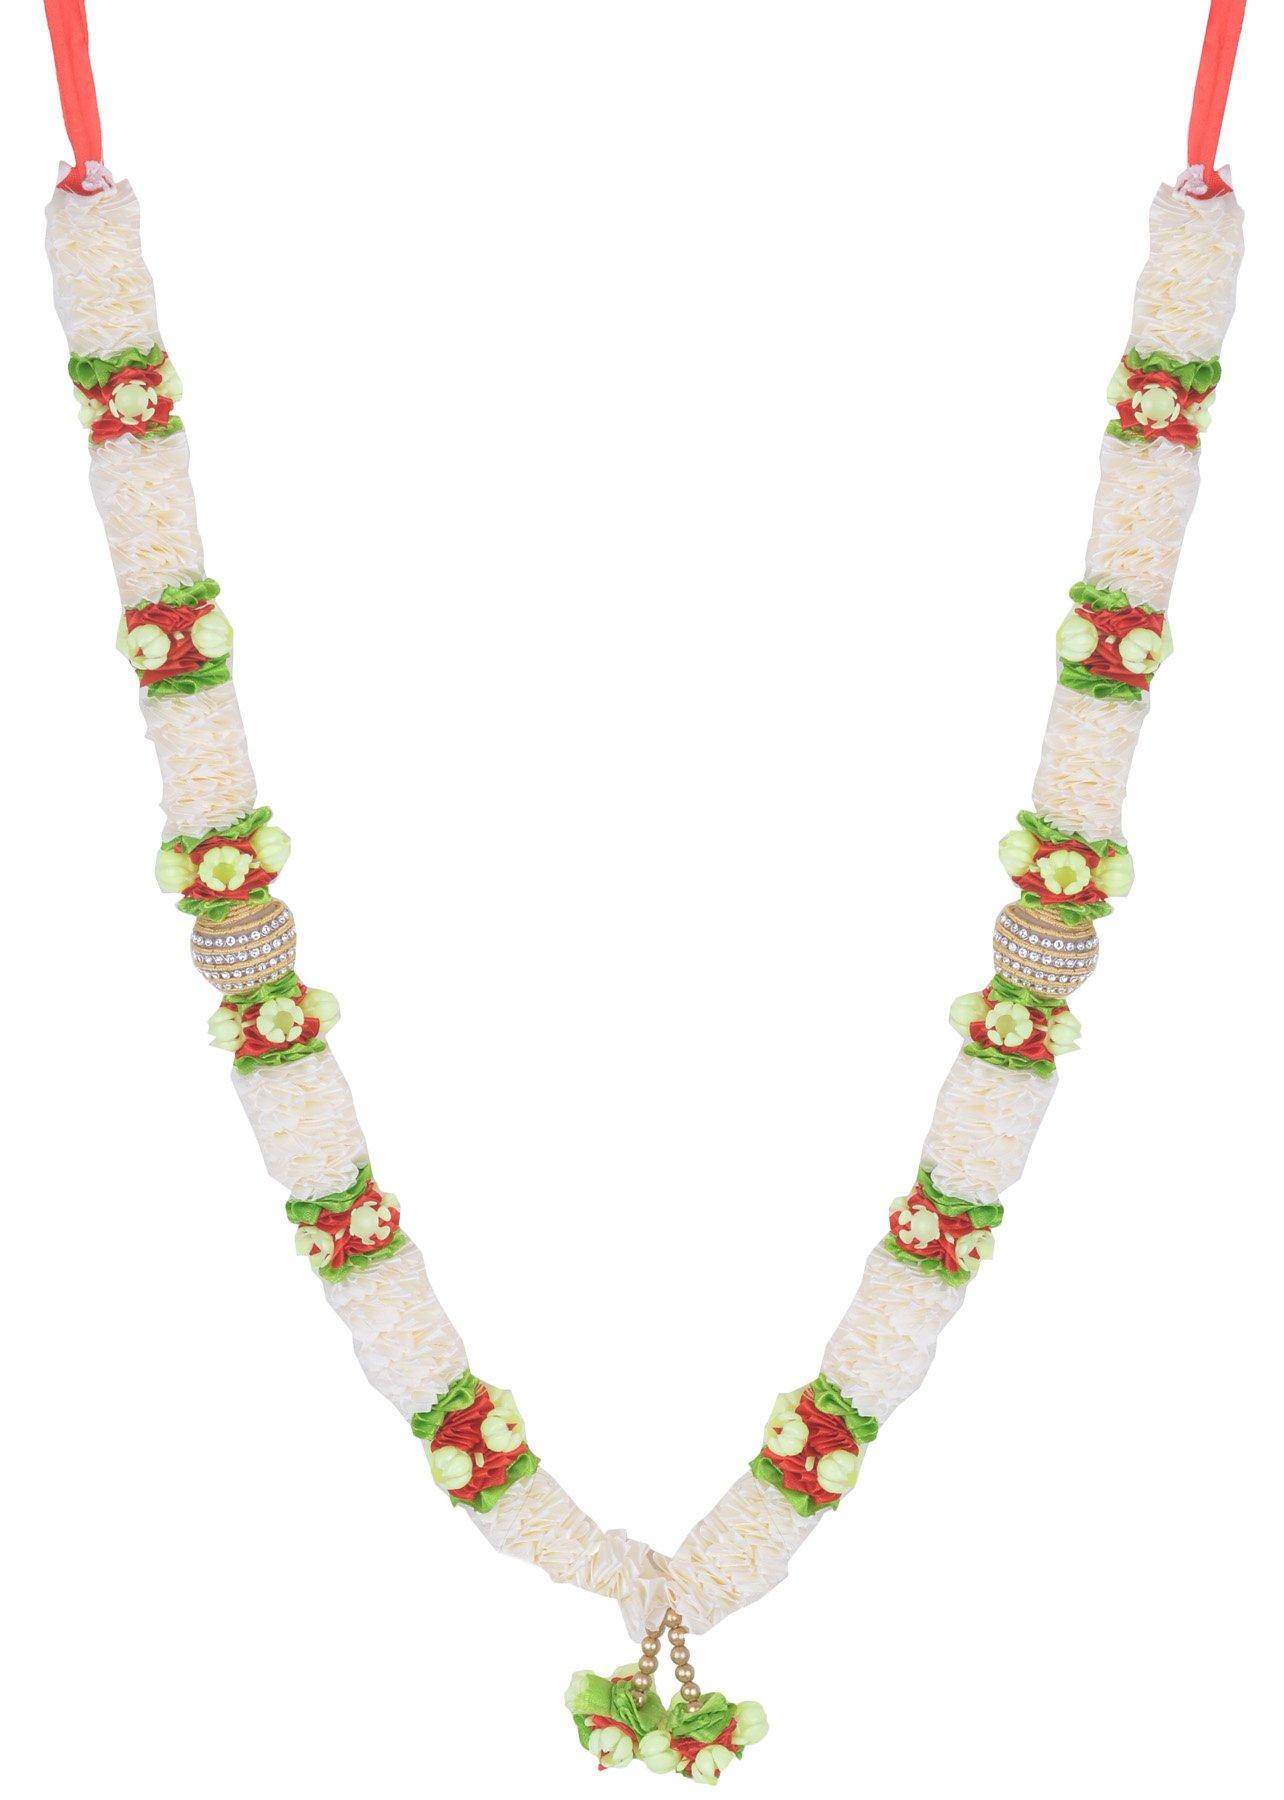 Decoration Craft Fabric Ribbon Off White colored Garland (48 CM + Ribbon)